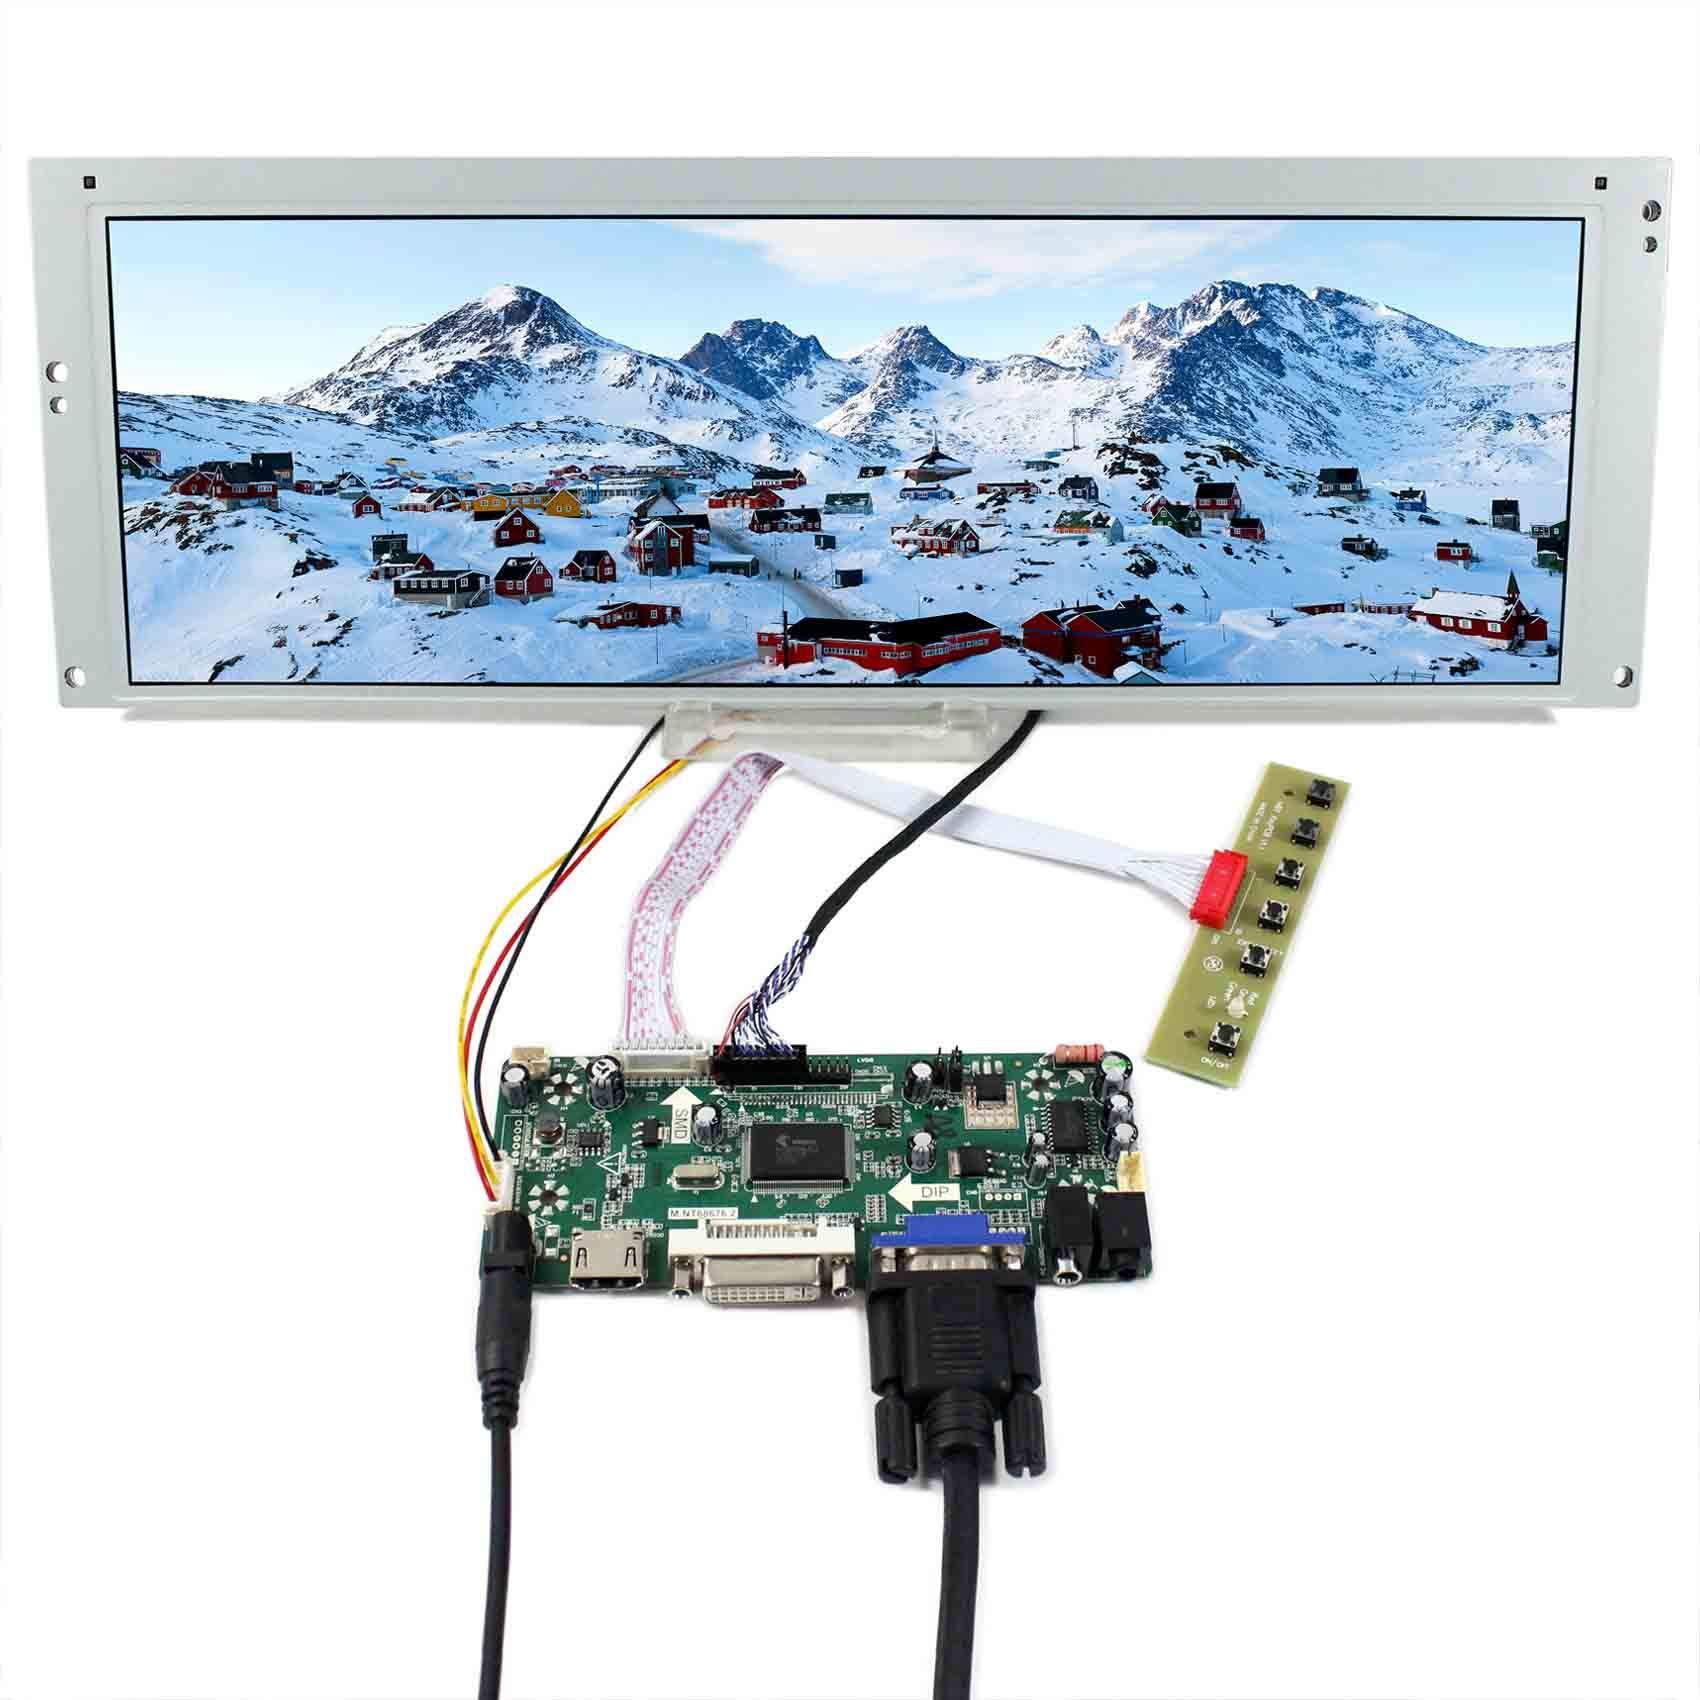 Controladora LCD HDMI VGA 14.9 1280x390 LTA149B780F